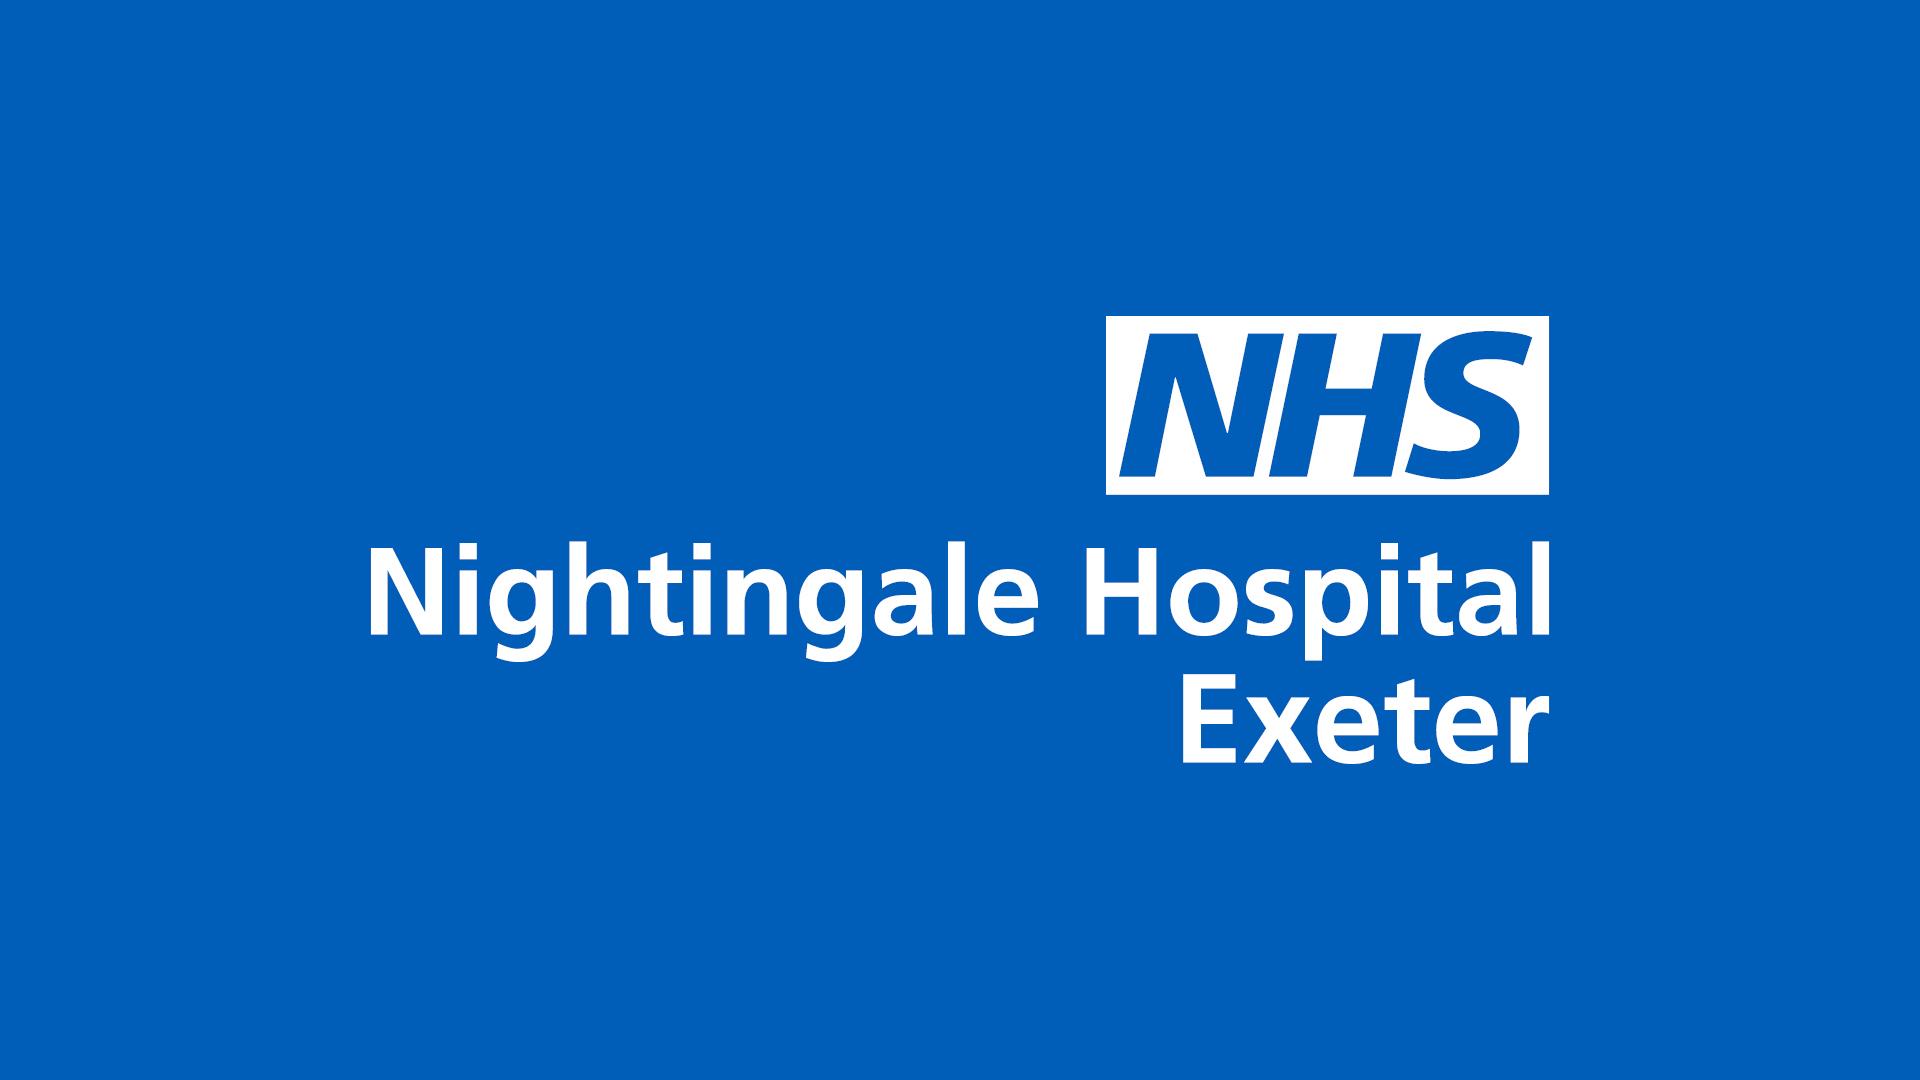 NHS nightingale hospital exeter